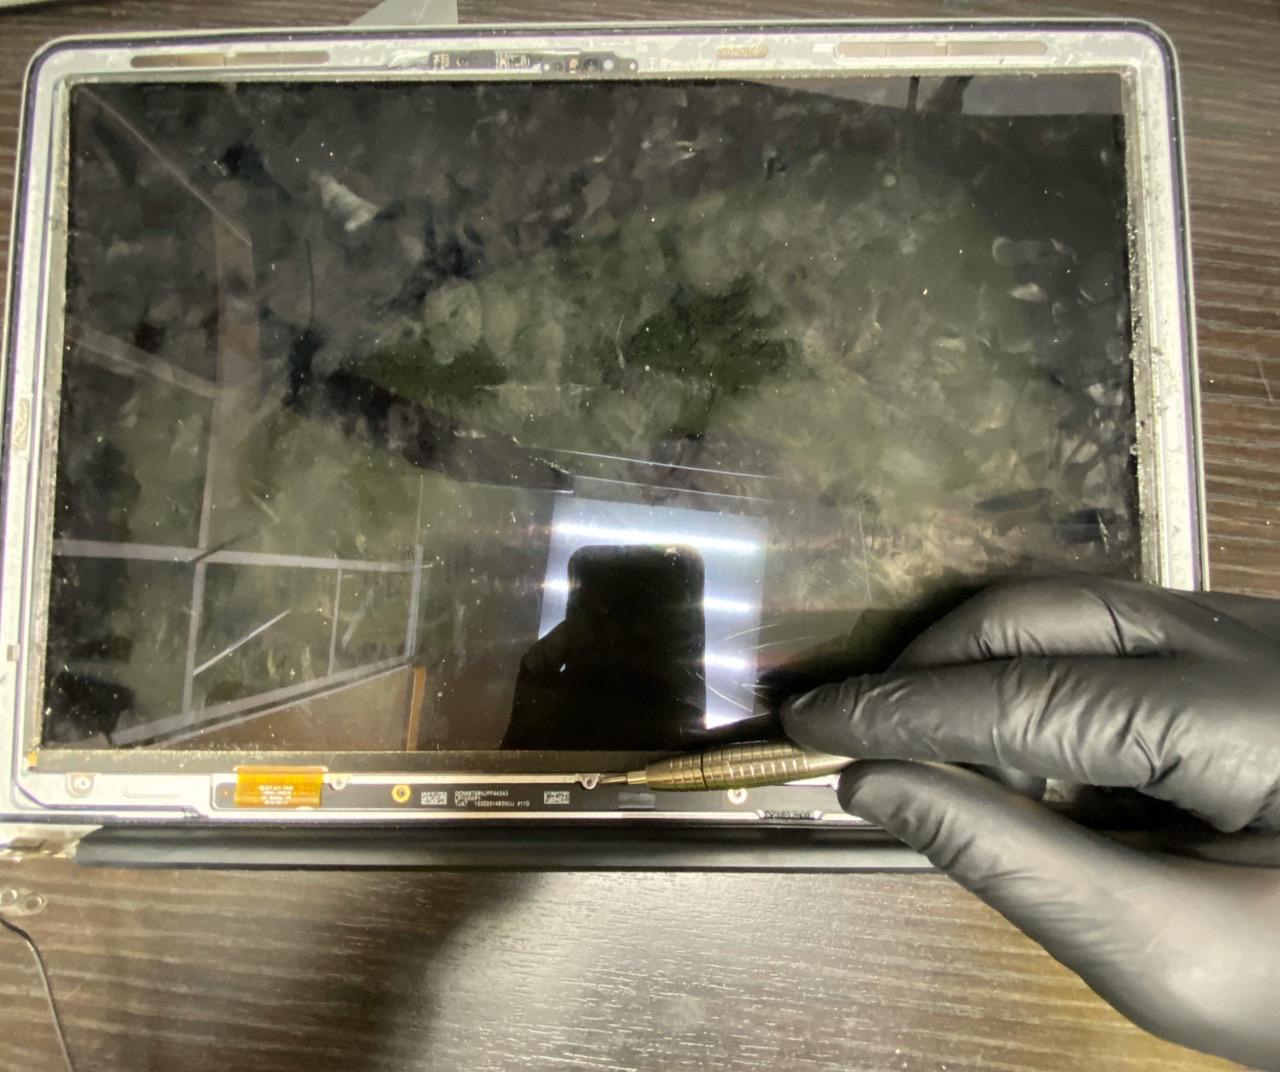 Замена шлейфа macbook, ремонт макбука